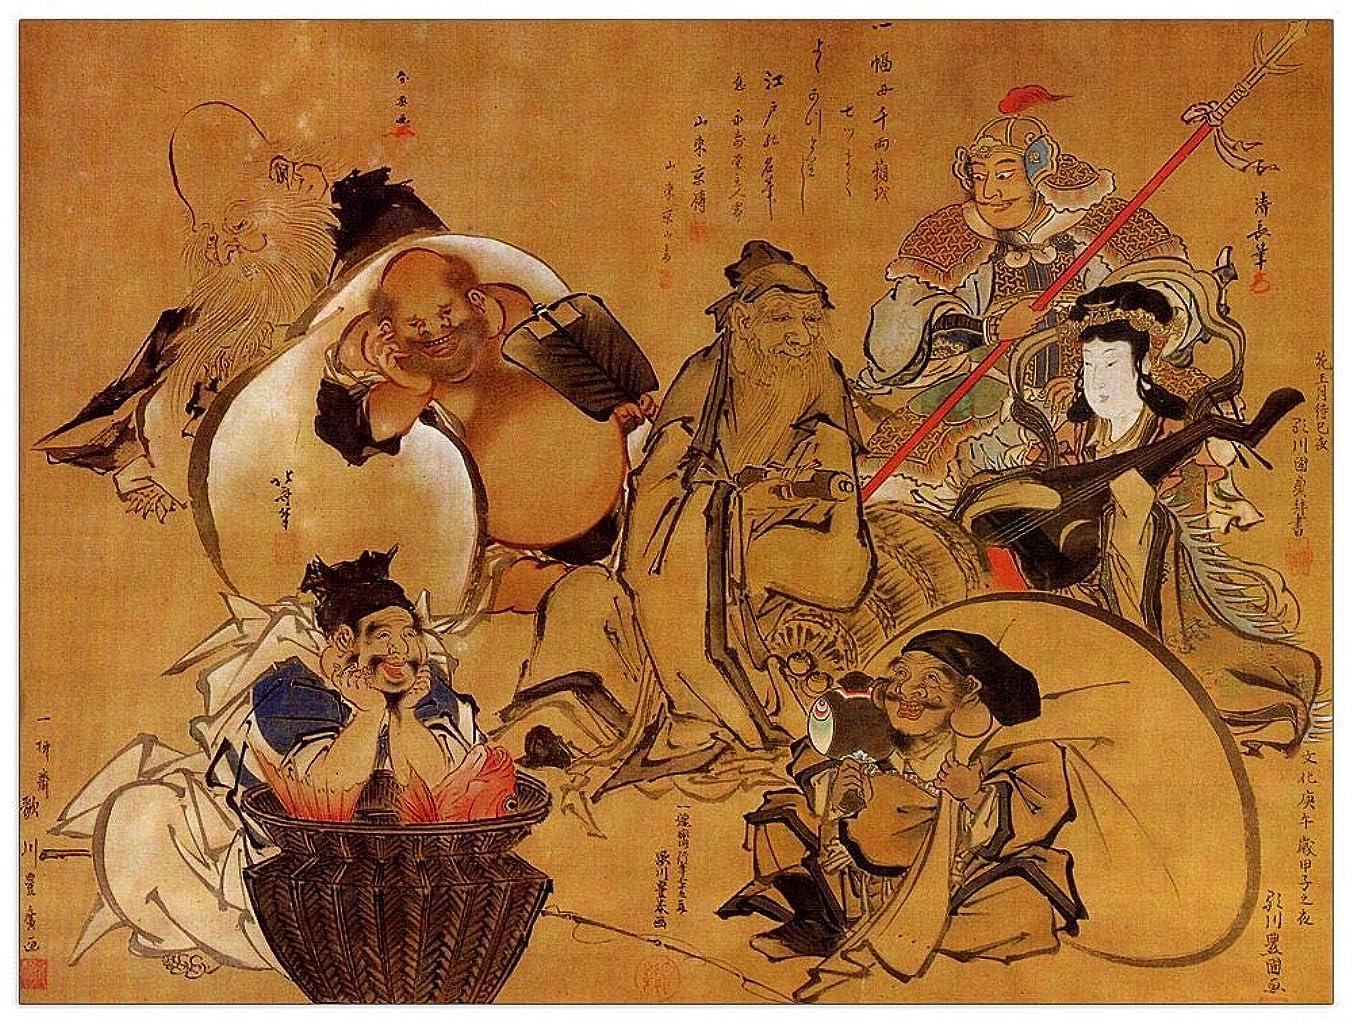 ArtPlaza TW90127 Hokusai Katsushika-Seven Gods of Fortune Decorative Panel, 35.5x27.5 Inch, Multicolored